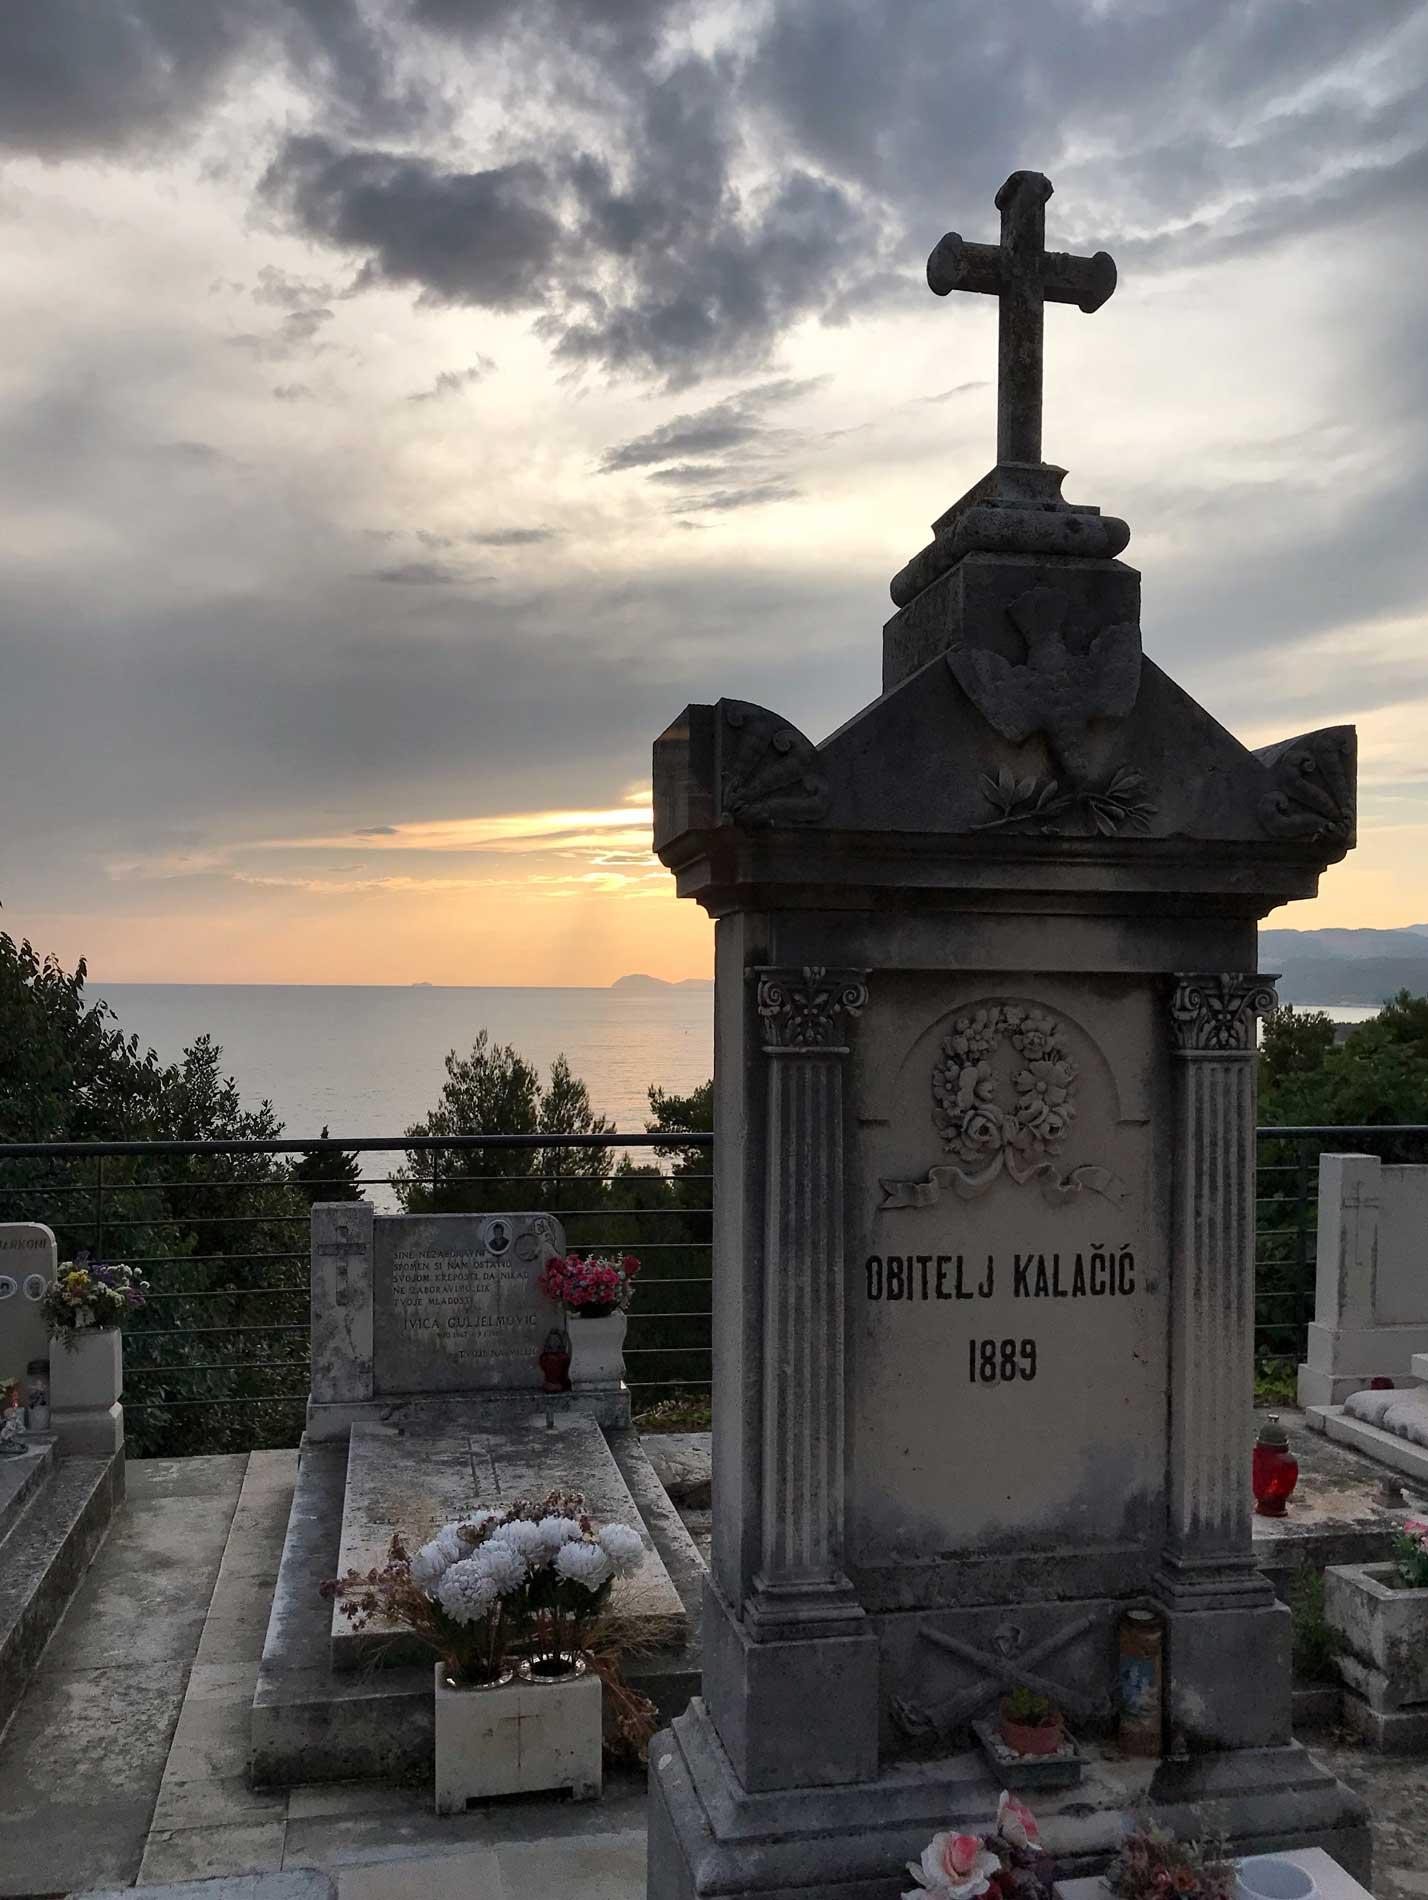 Cavtat-Dubrovnik-Croazia-cimitero-lapidi-tramonto